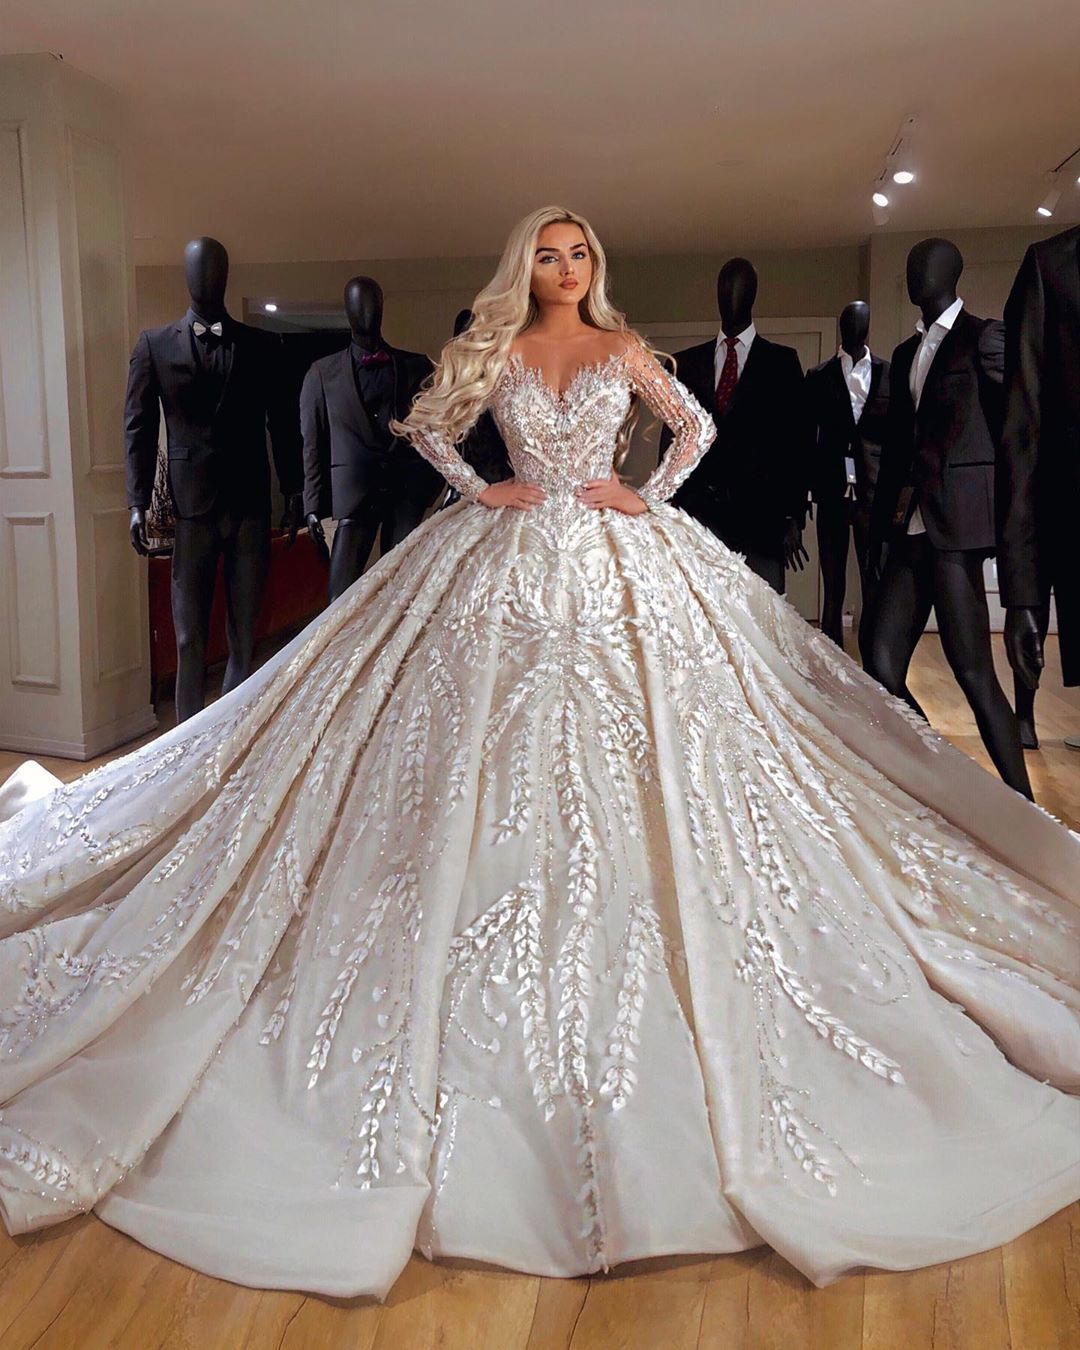 19++ Valdrin sahiti wedding dresses ideas in 2021